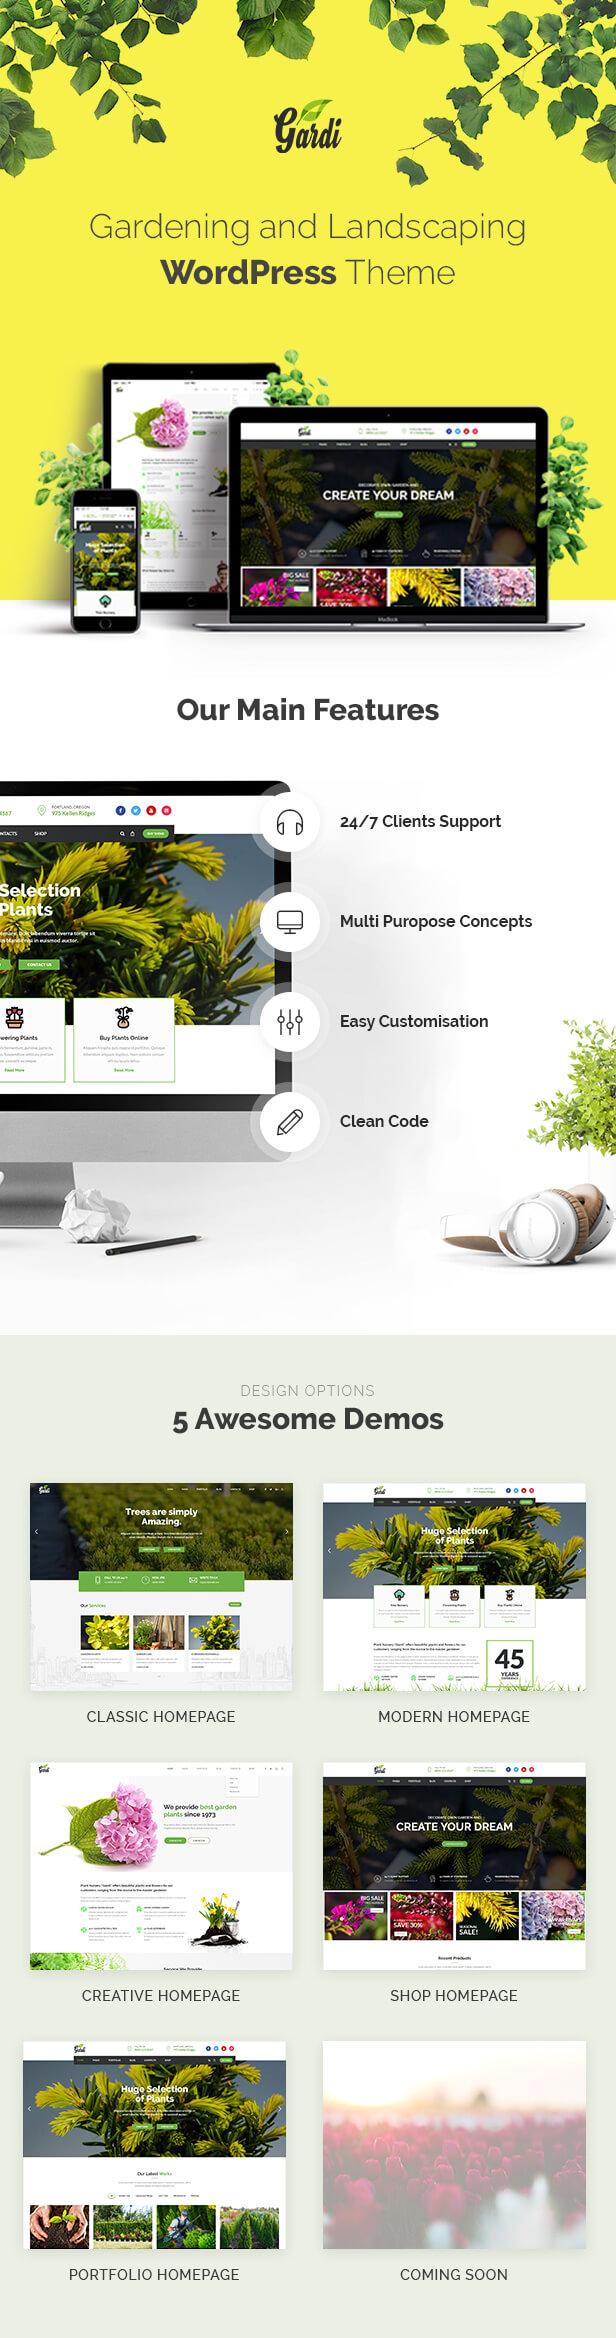 gardi | gardening and landscaping wordpress theme (business) Gardi | Gardening and Landscaping WordPress Theme (Business) canvas